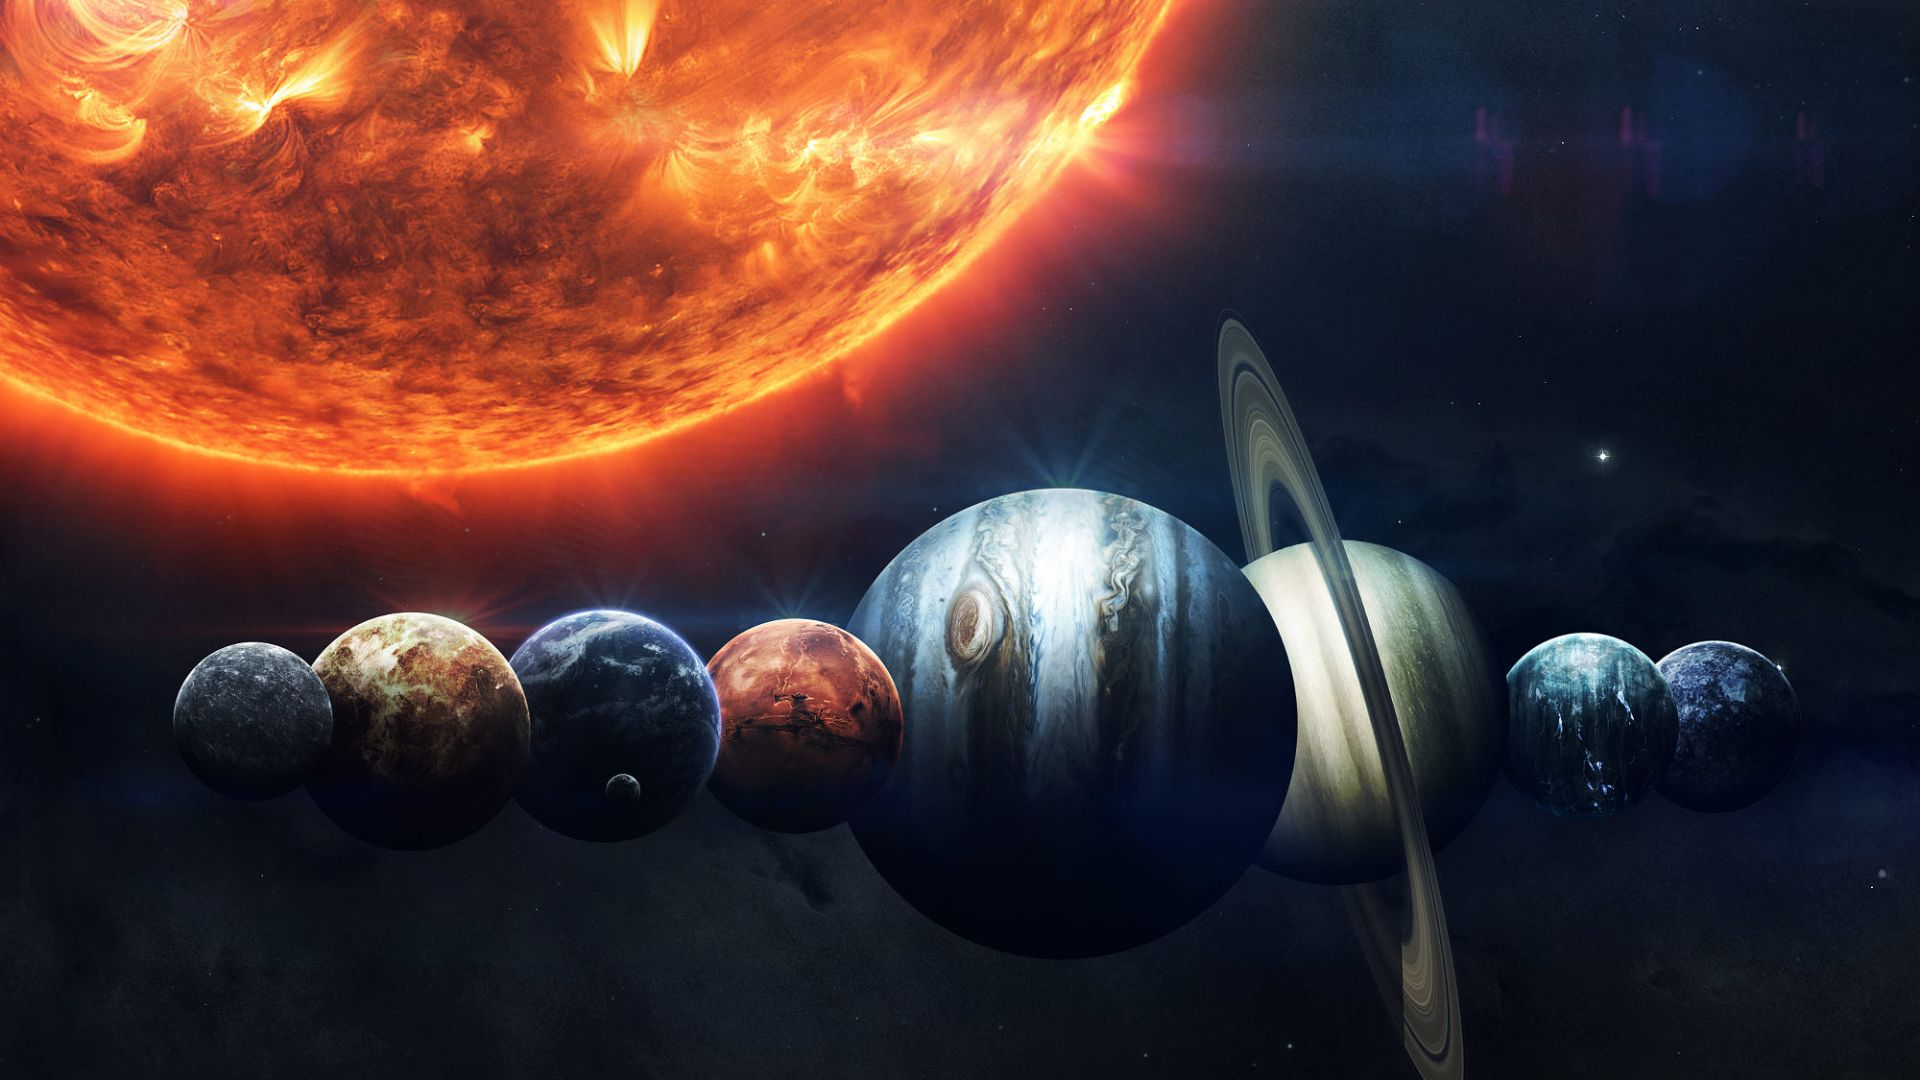 Wallpaper Sun Planet Hd Space 16032